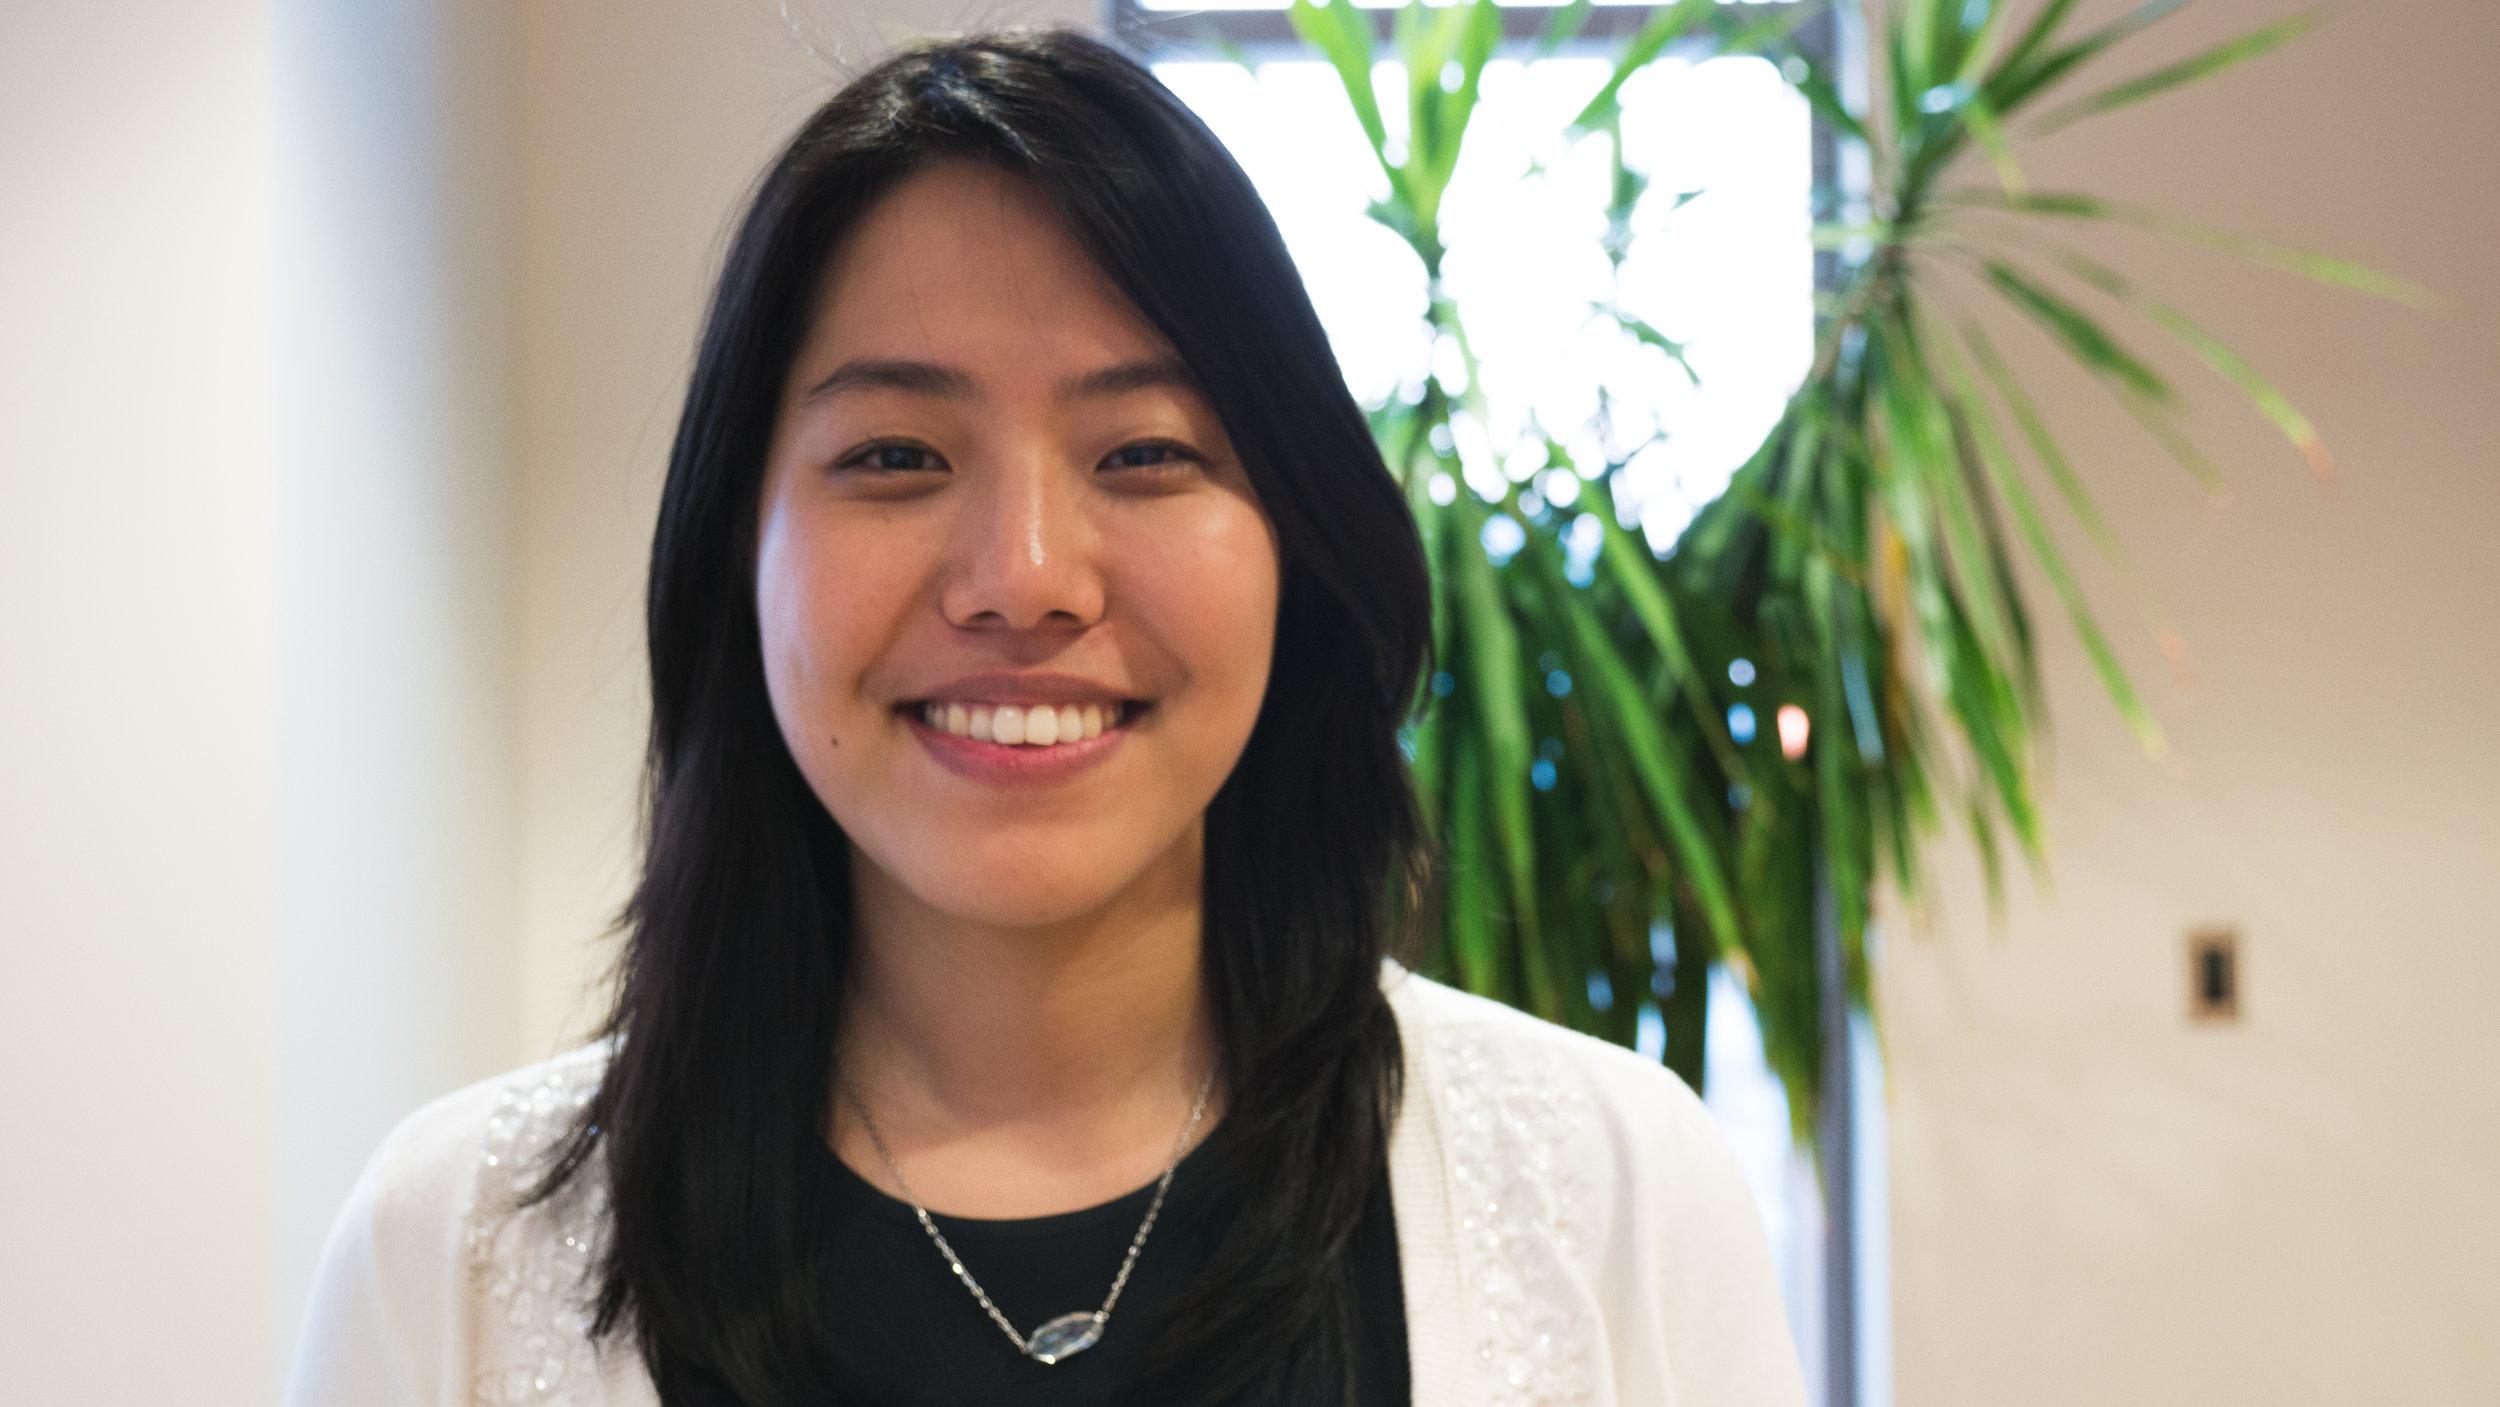 Liz Kim  | Vice President, Career Advisor, & Mentor  Michigan State University | BA Finance Loop Capital Markets | Investment Banking Analyst   LinkedIn Profile    >